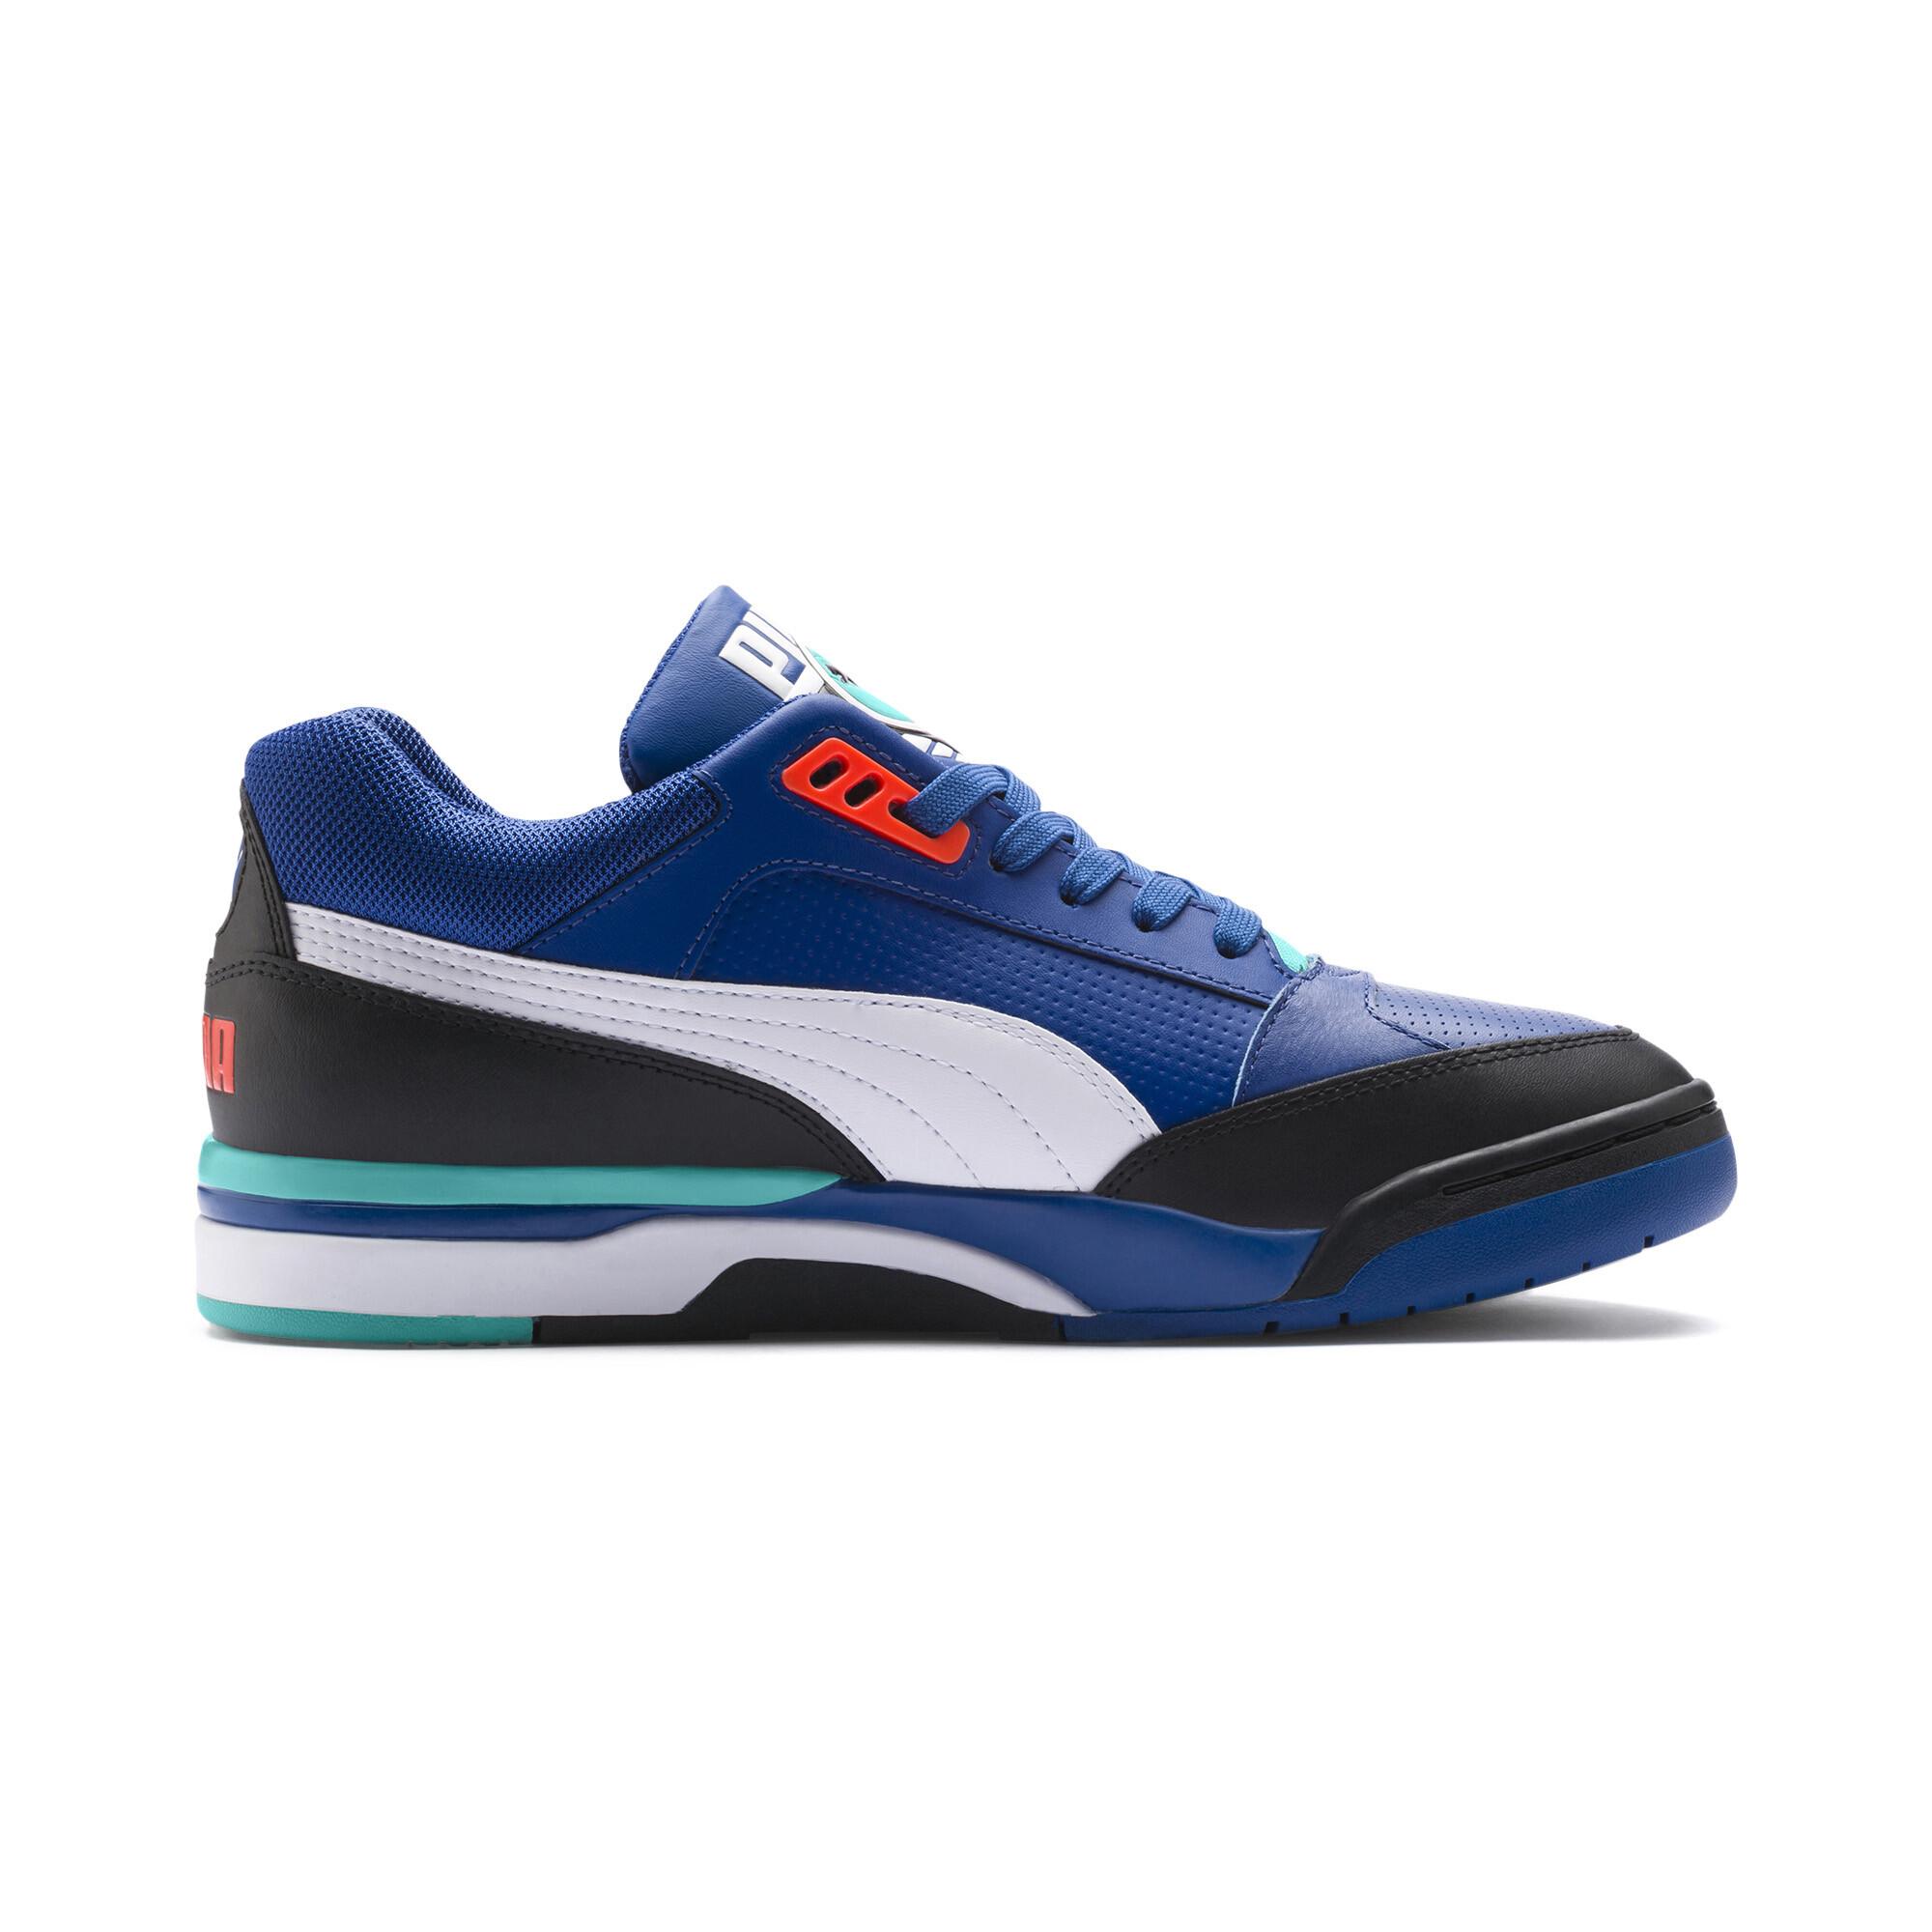 Indexbild 45 - PUMA Palace Guard Sneaker Unisex Schuhe Sport Classics Neu